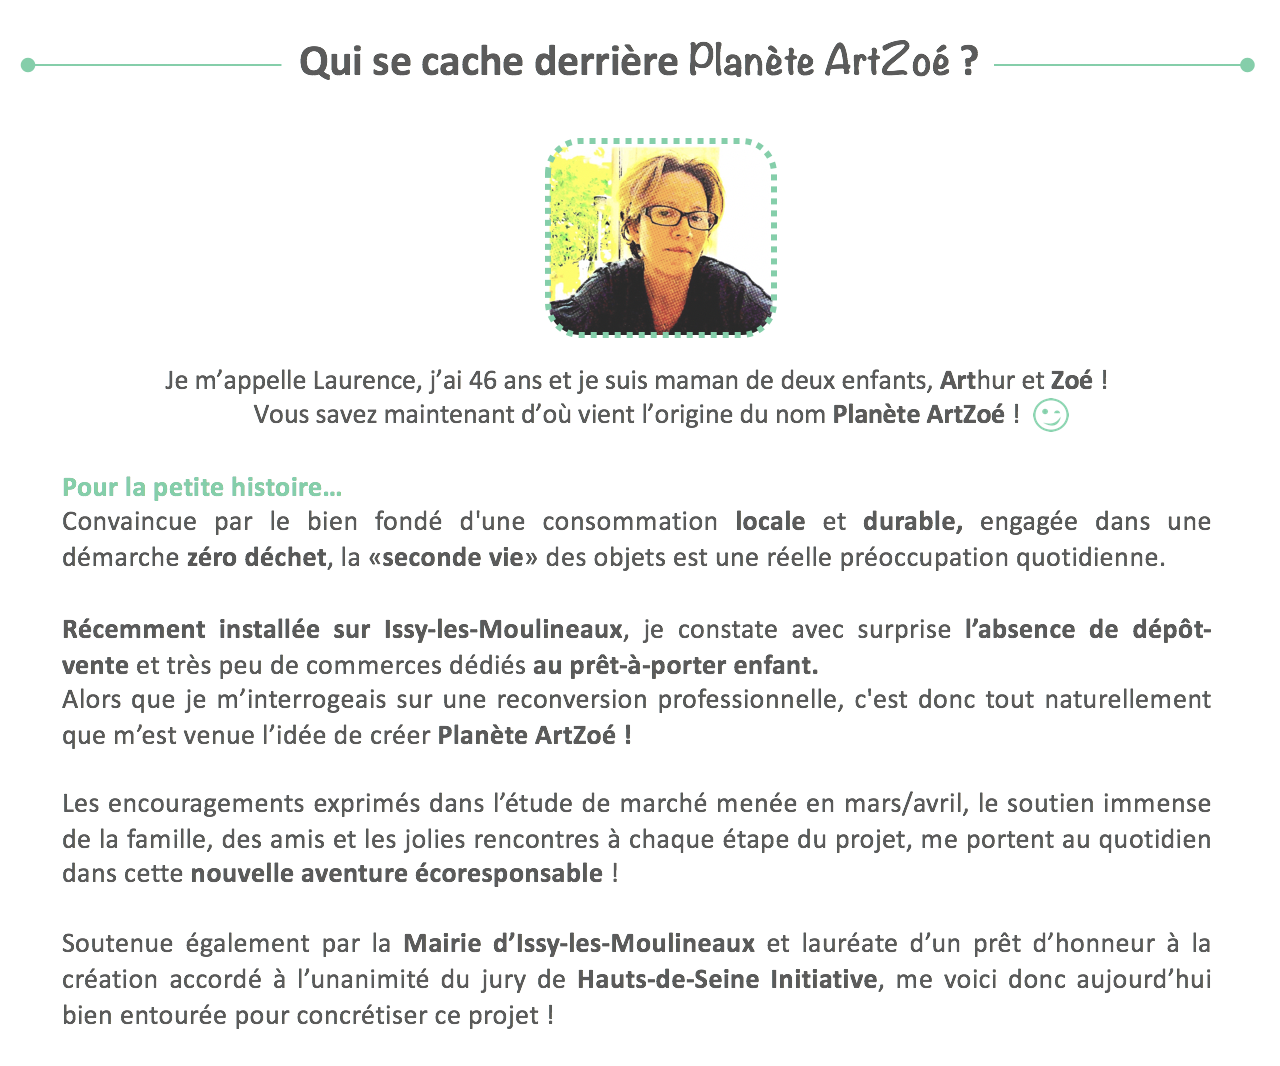 Planete Artzoe Un Crowdfunding Commerce De Proximite Sur Tudigo Page 4